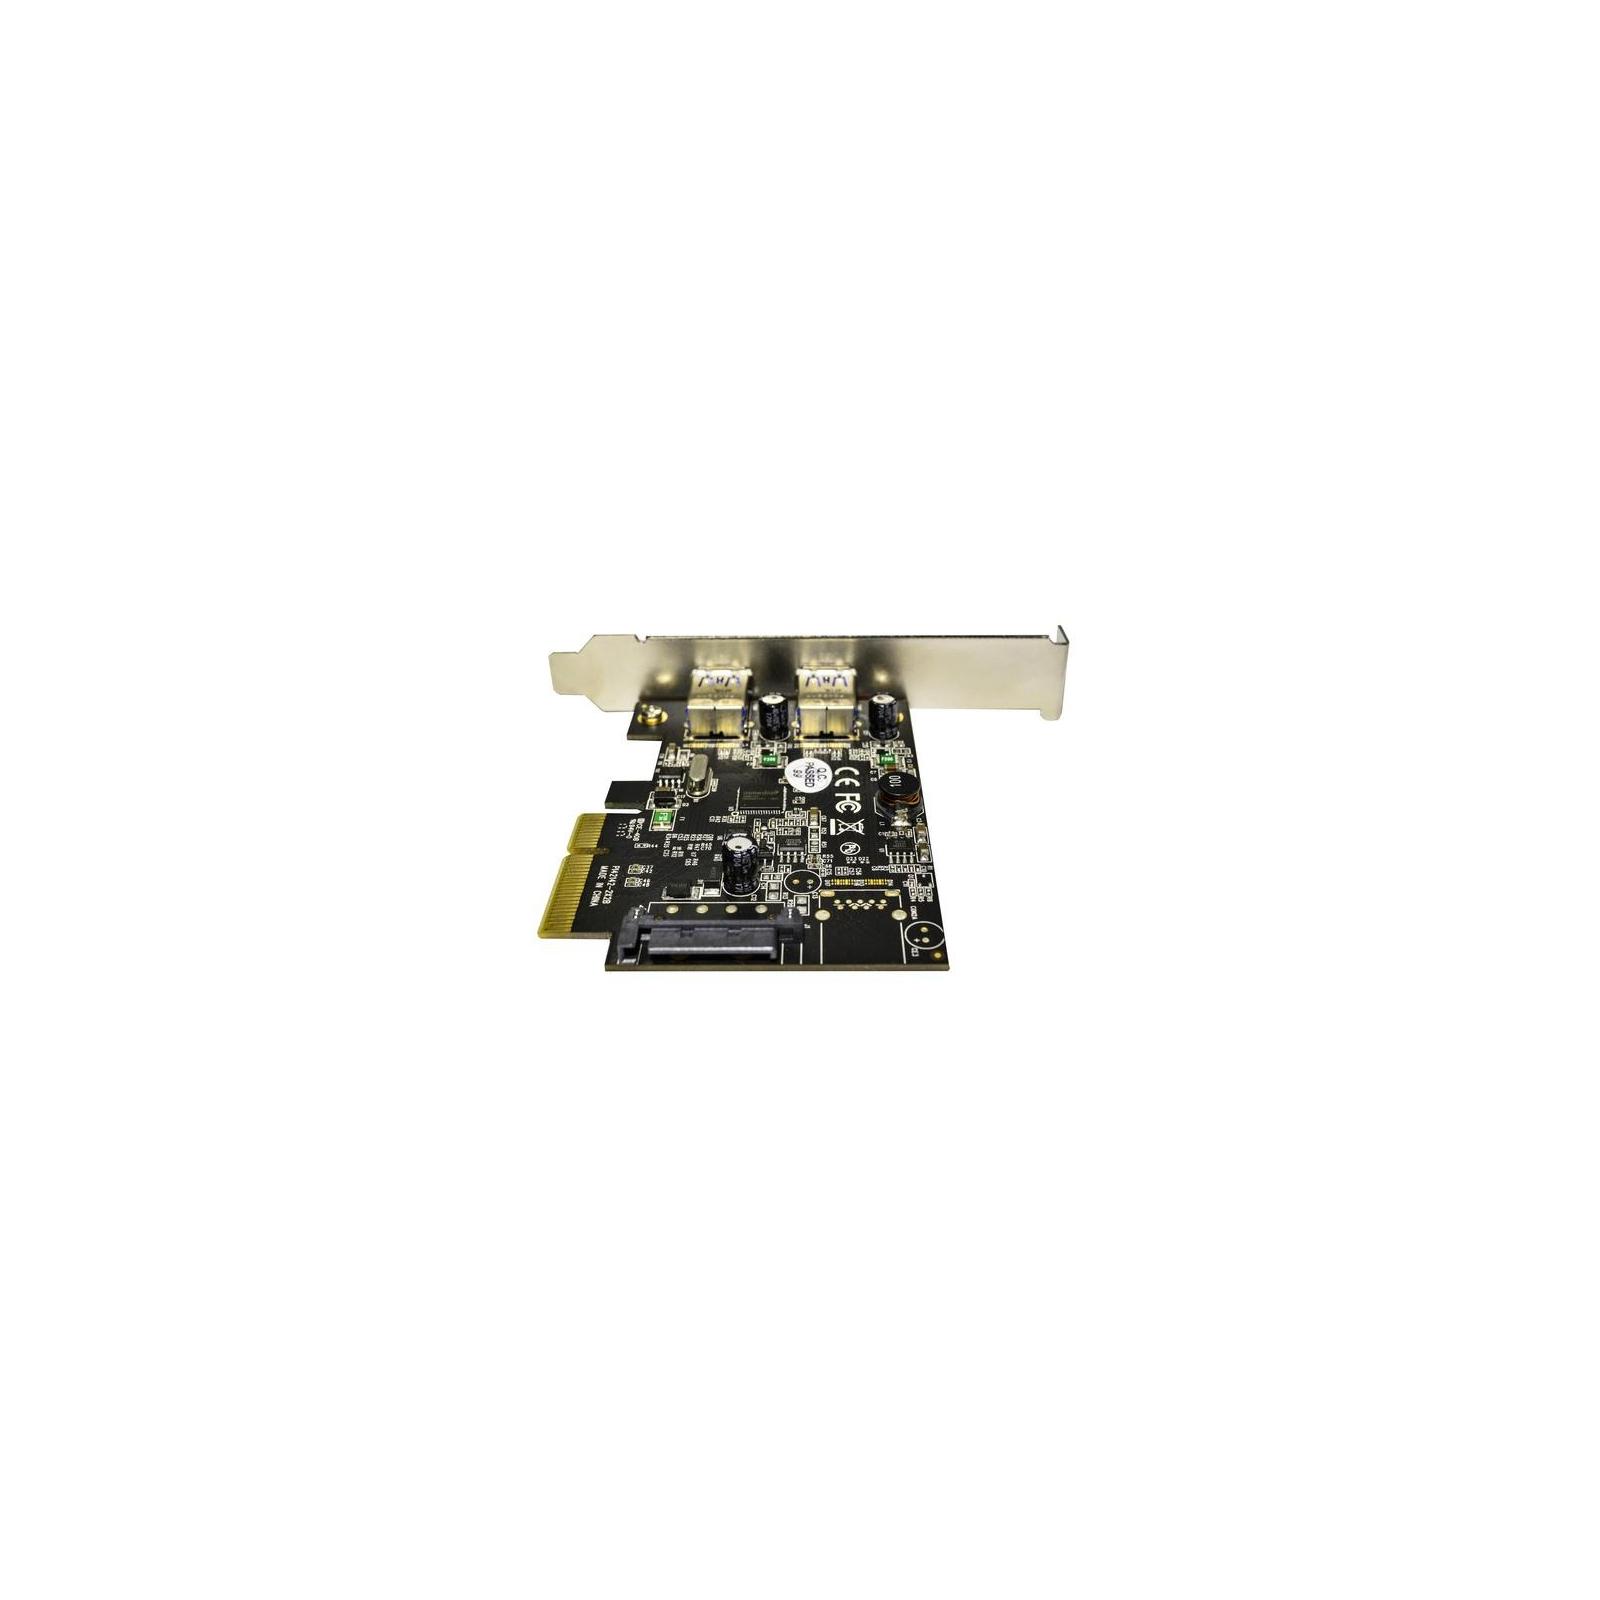 Контроллер PCI to USB3.1 Gen2 2xType-A PCI-E Gen-III x2+планка Low Prof ST-Lab (U-1640) изображение 2